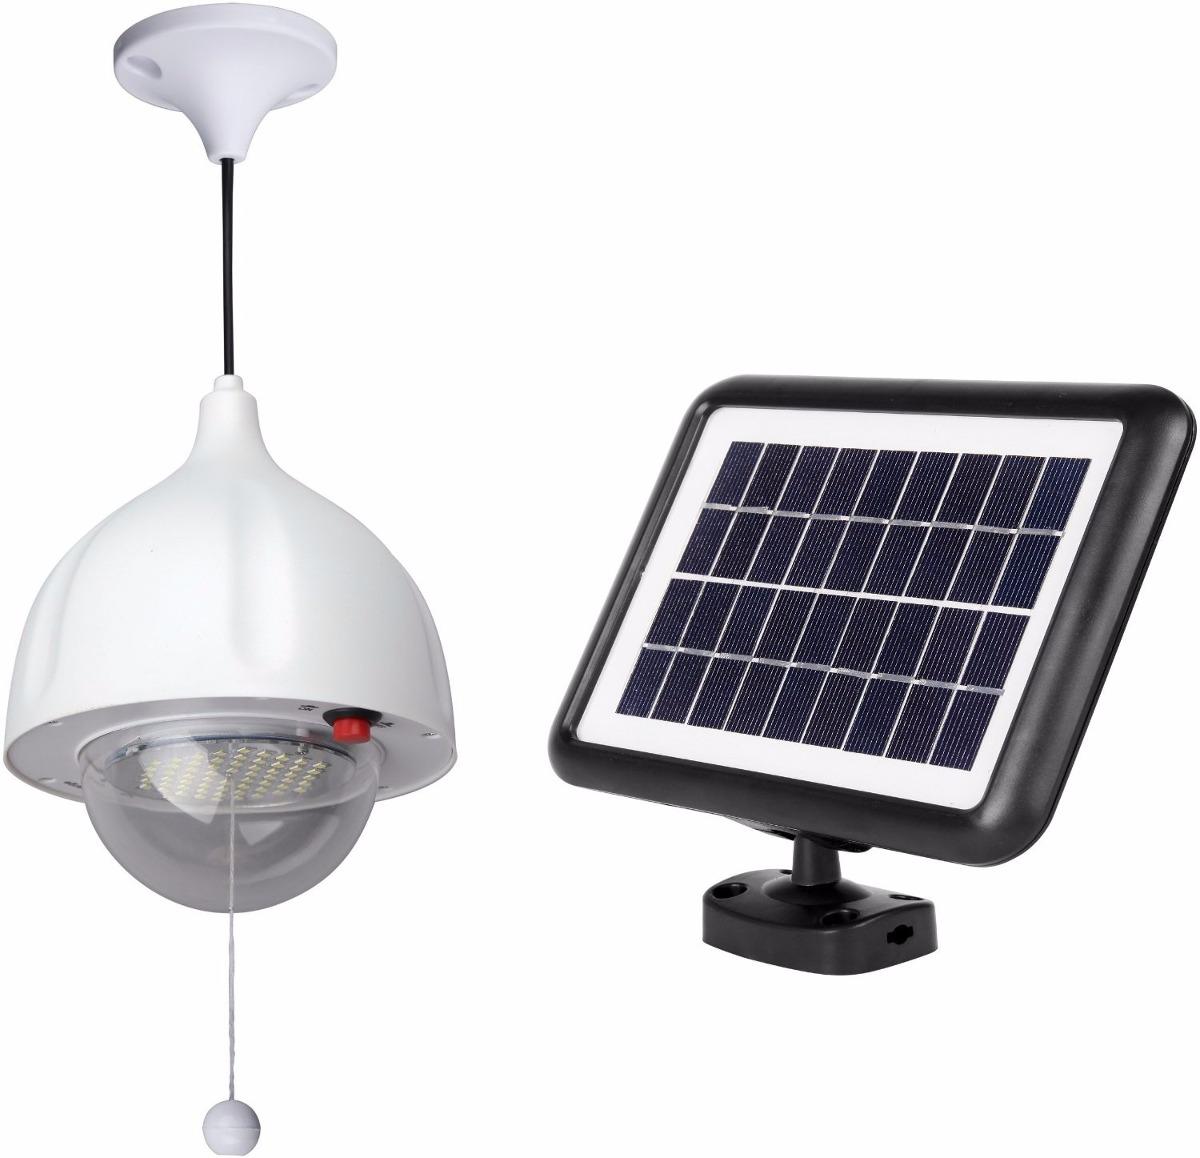 Lamparas solares para interiores - Lamparas solares interior ...